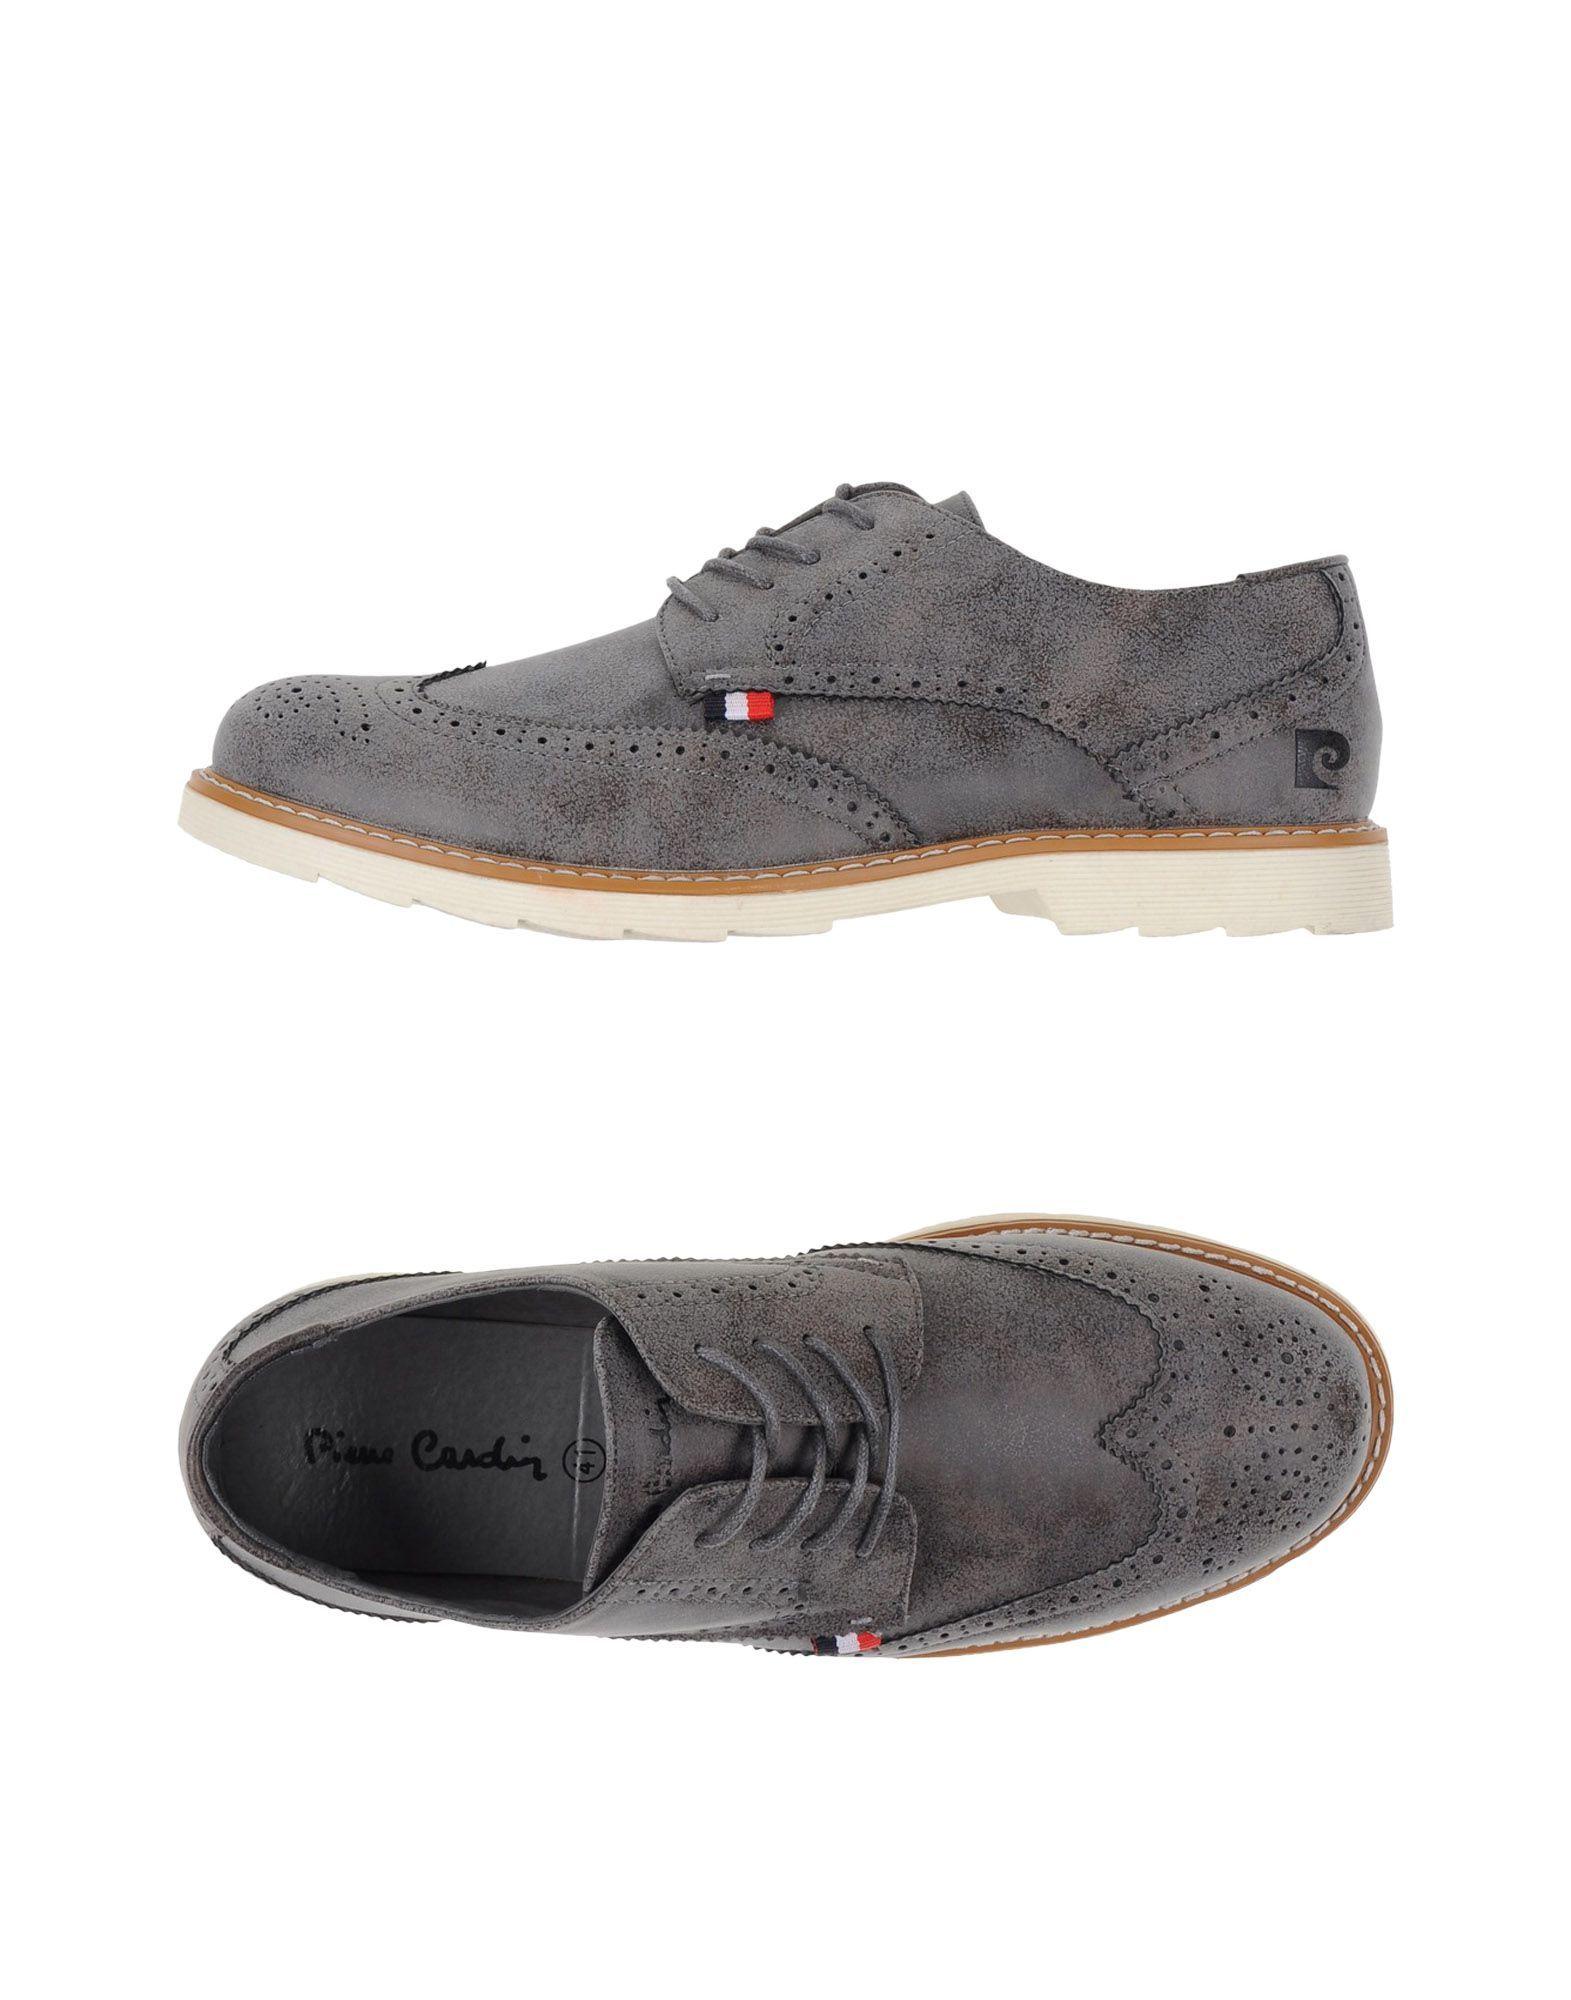 Pierre Cardin Grey Lace Up Shoes